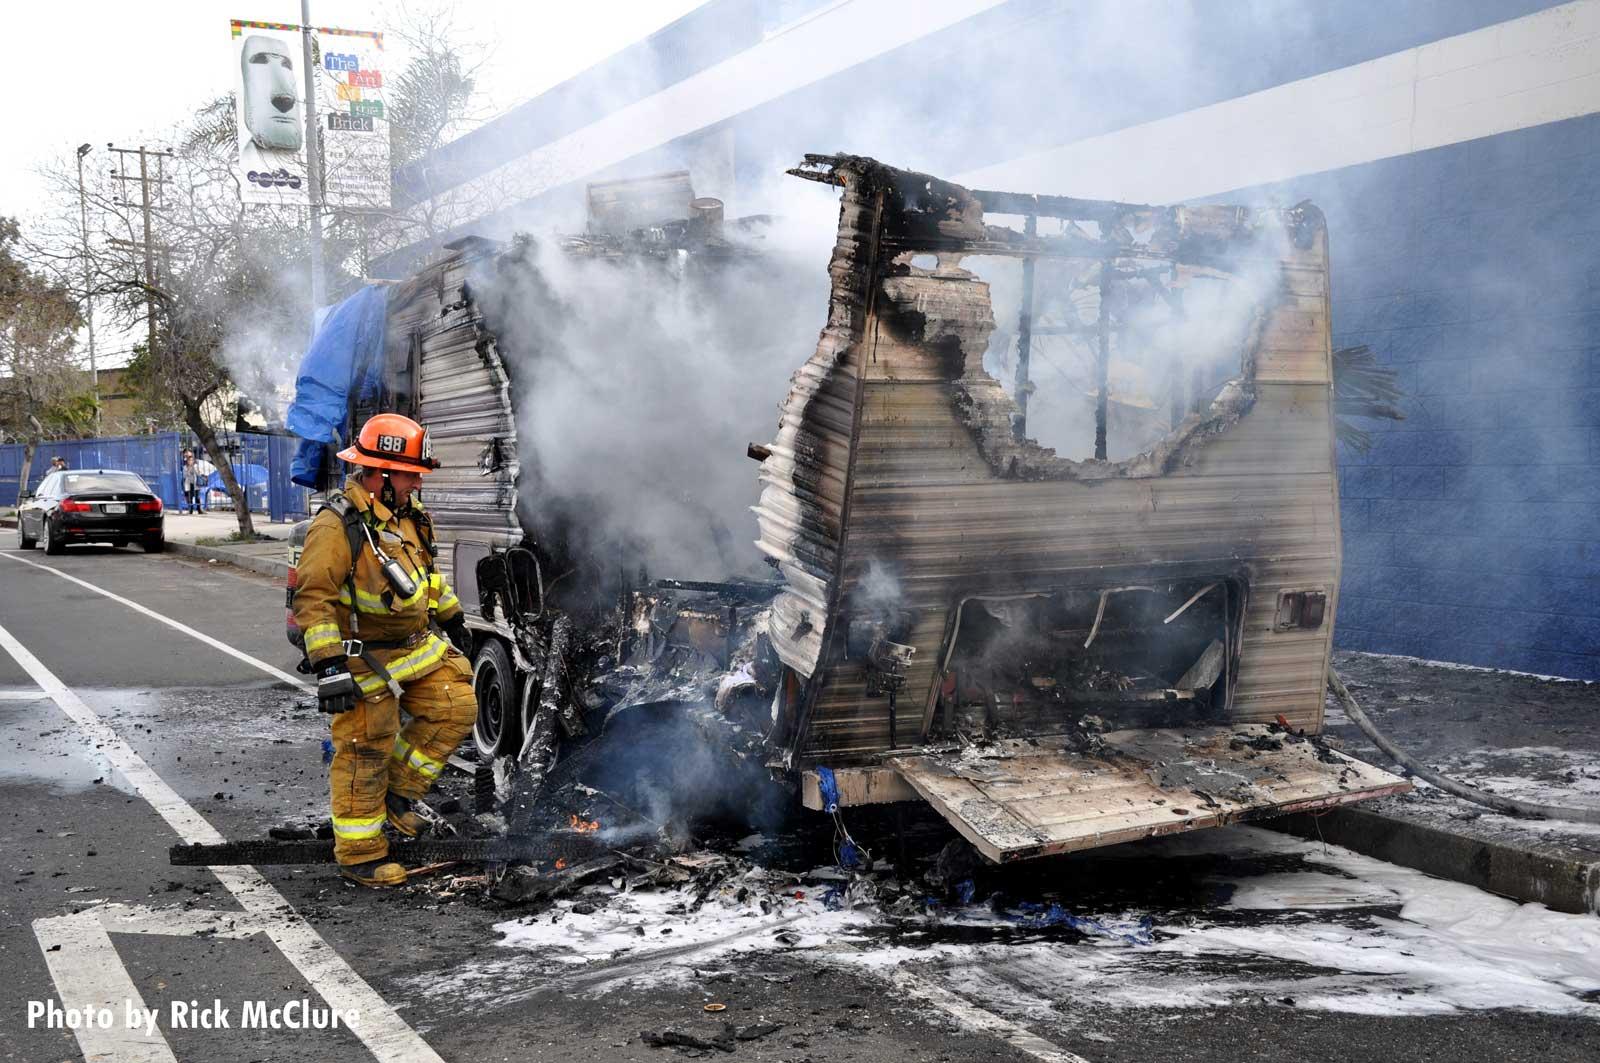 Firefighter navigating around wreckage of burnt trailer